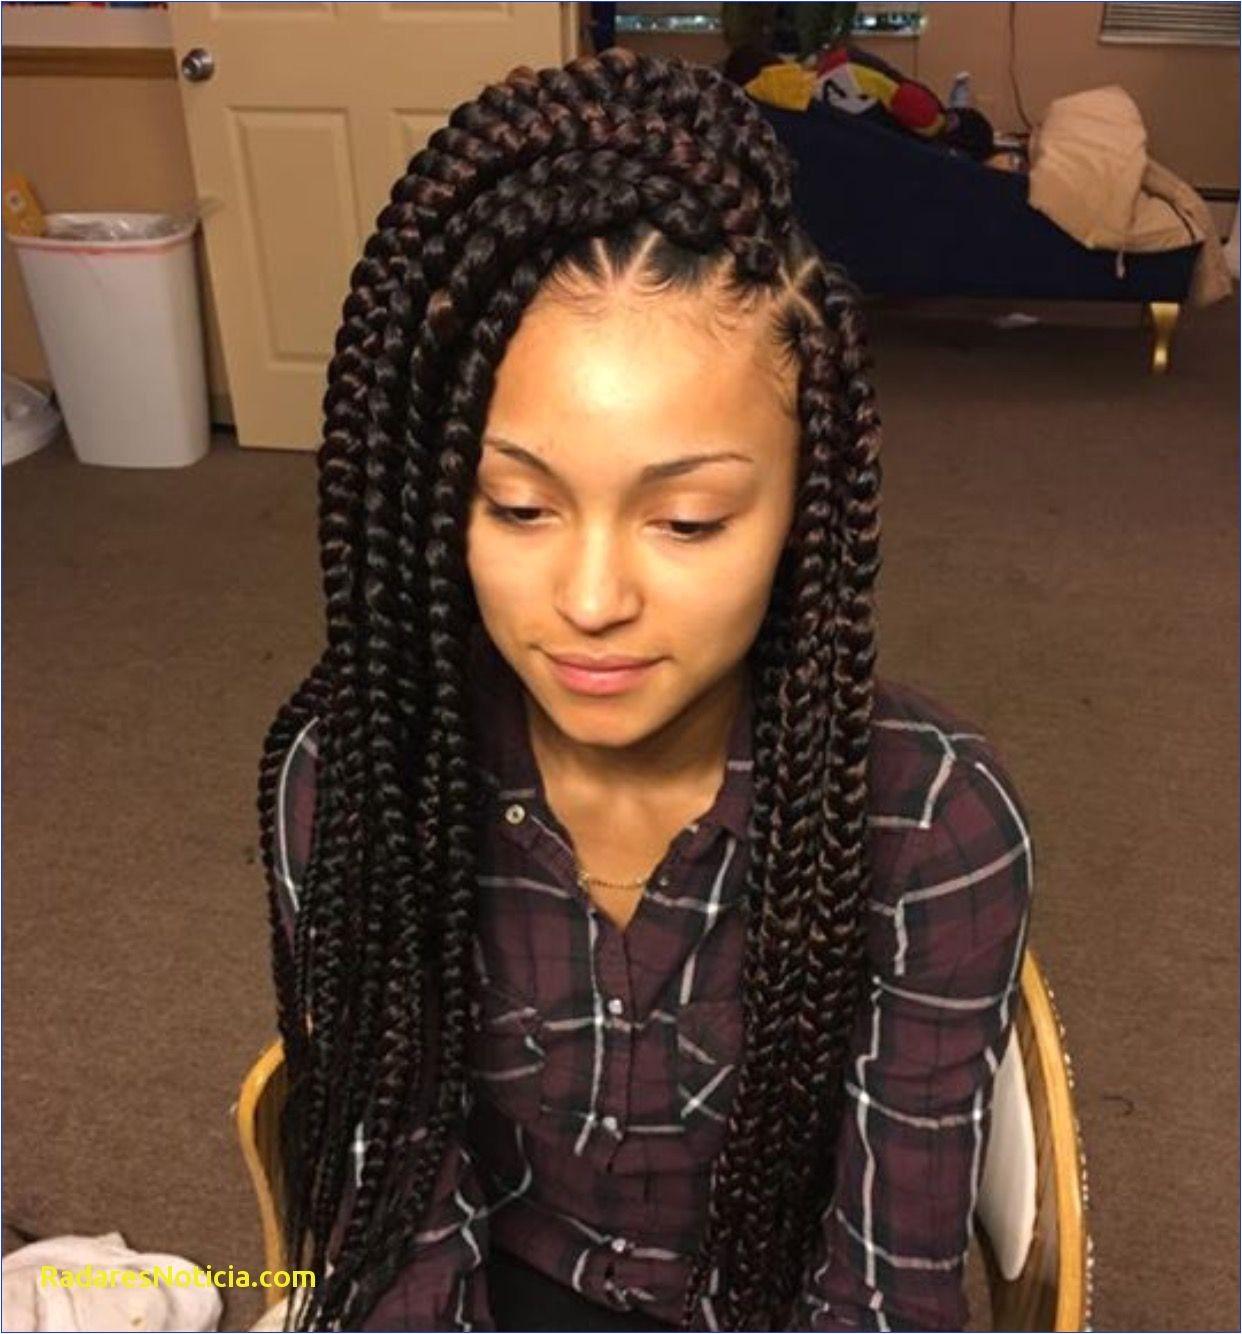 14 Best Black Braided Hairstyles 2015 Different Hair Braiding Styles